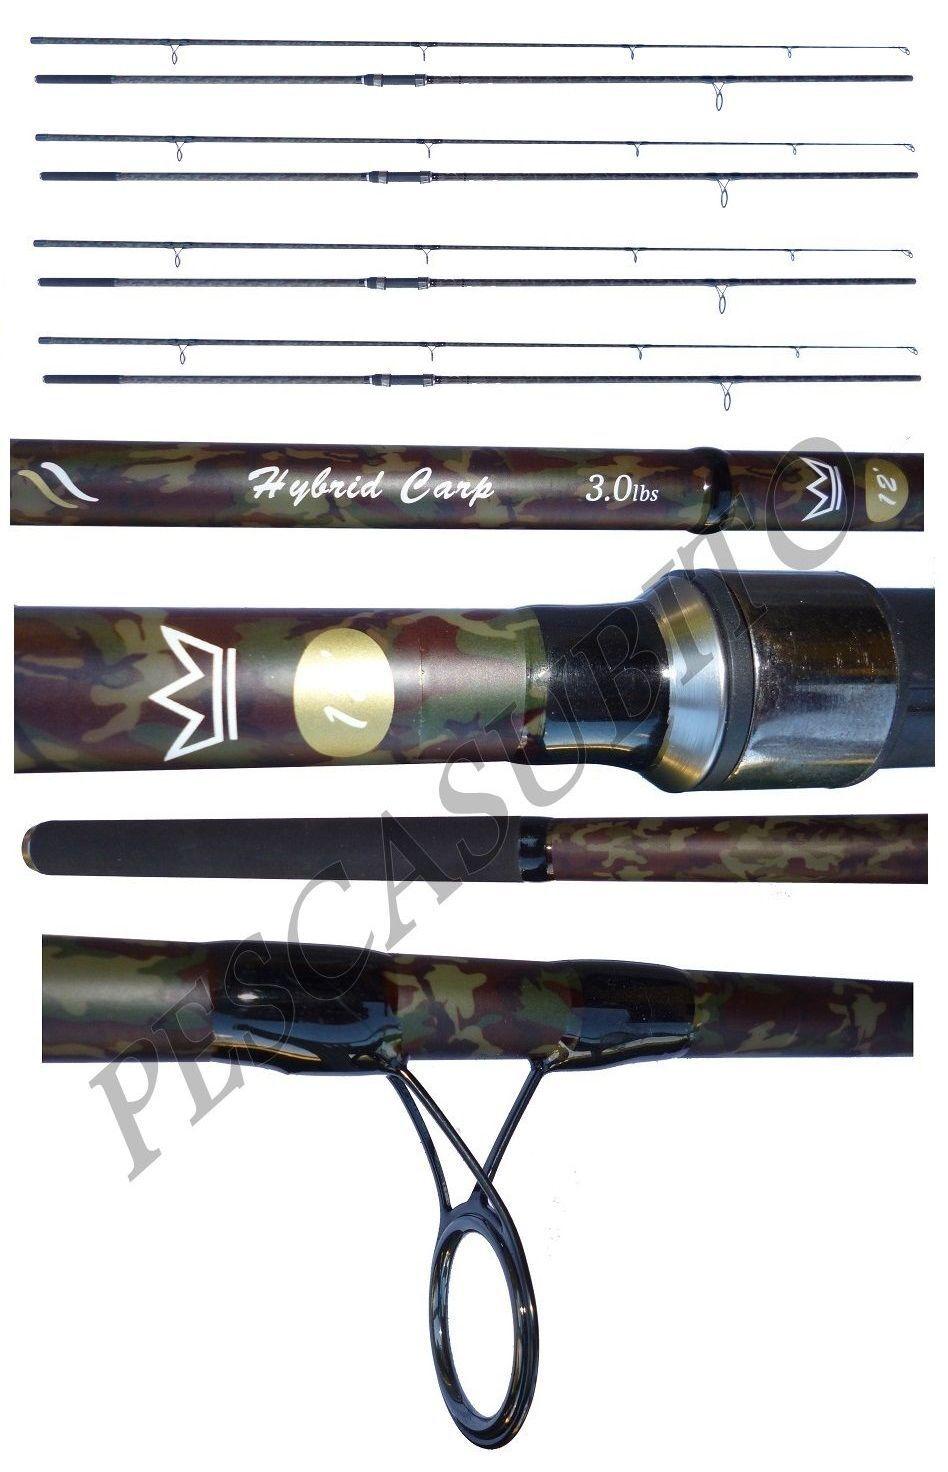 Kit 4 canne mimetiche pesca carpfishing carp fishing 12 piedi 3Lb pesca carpa